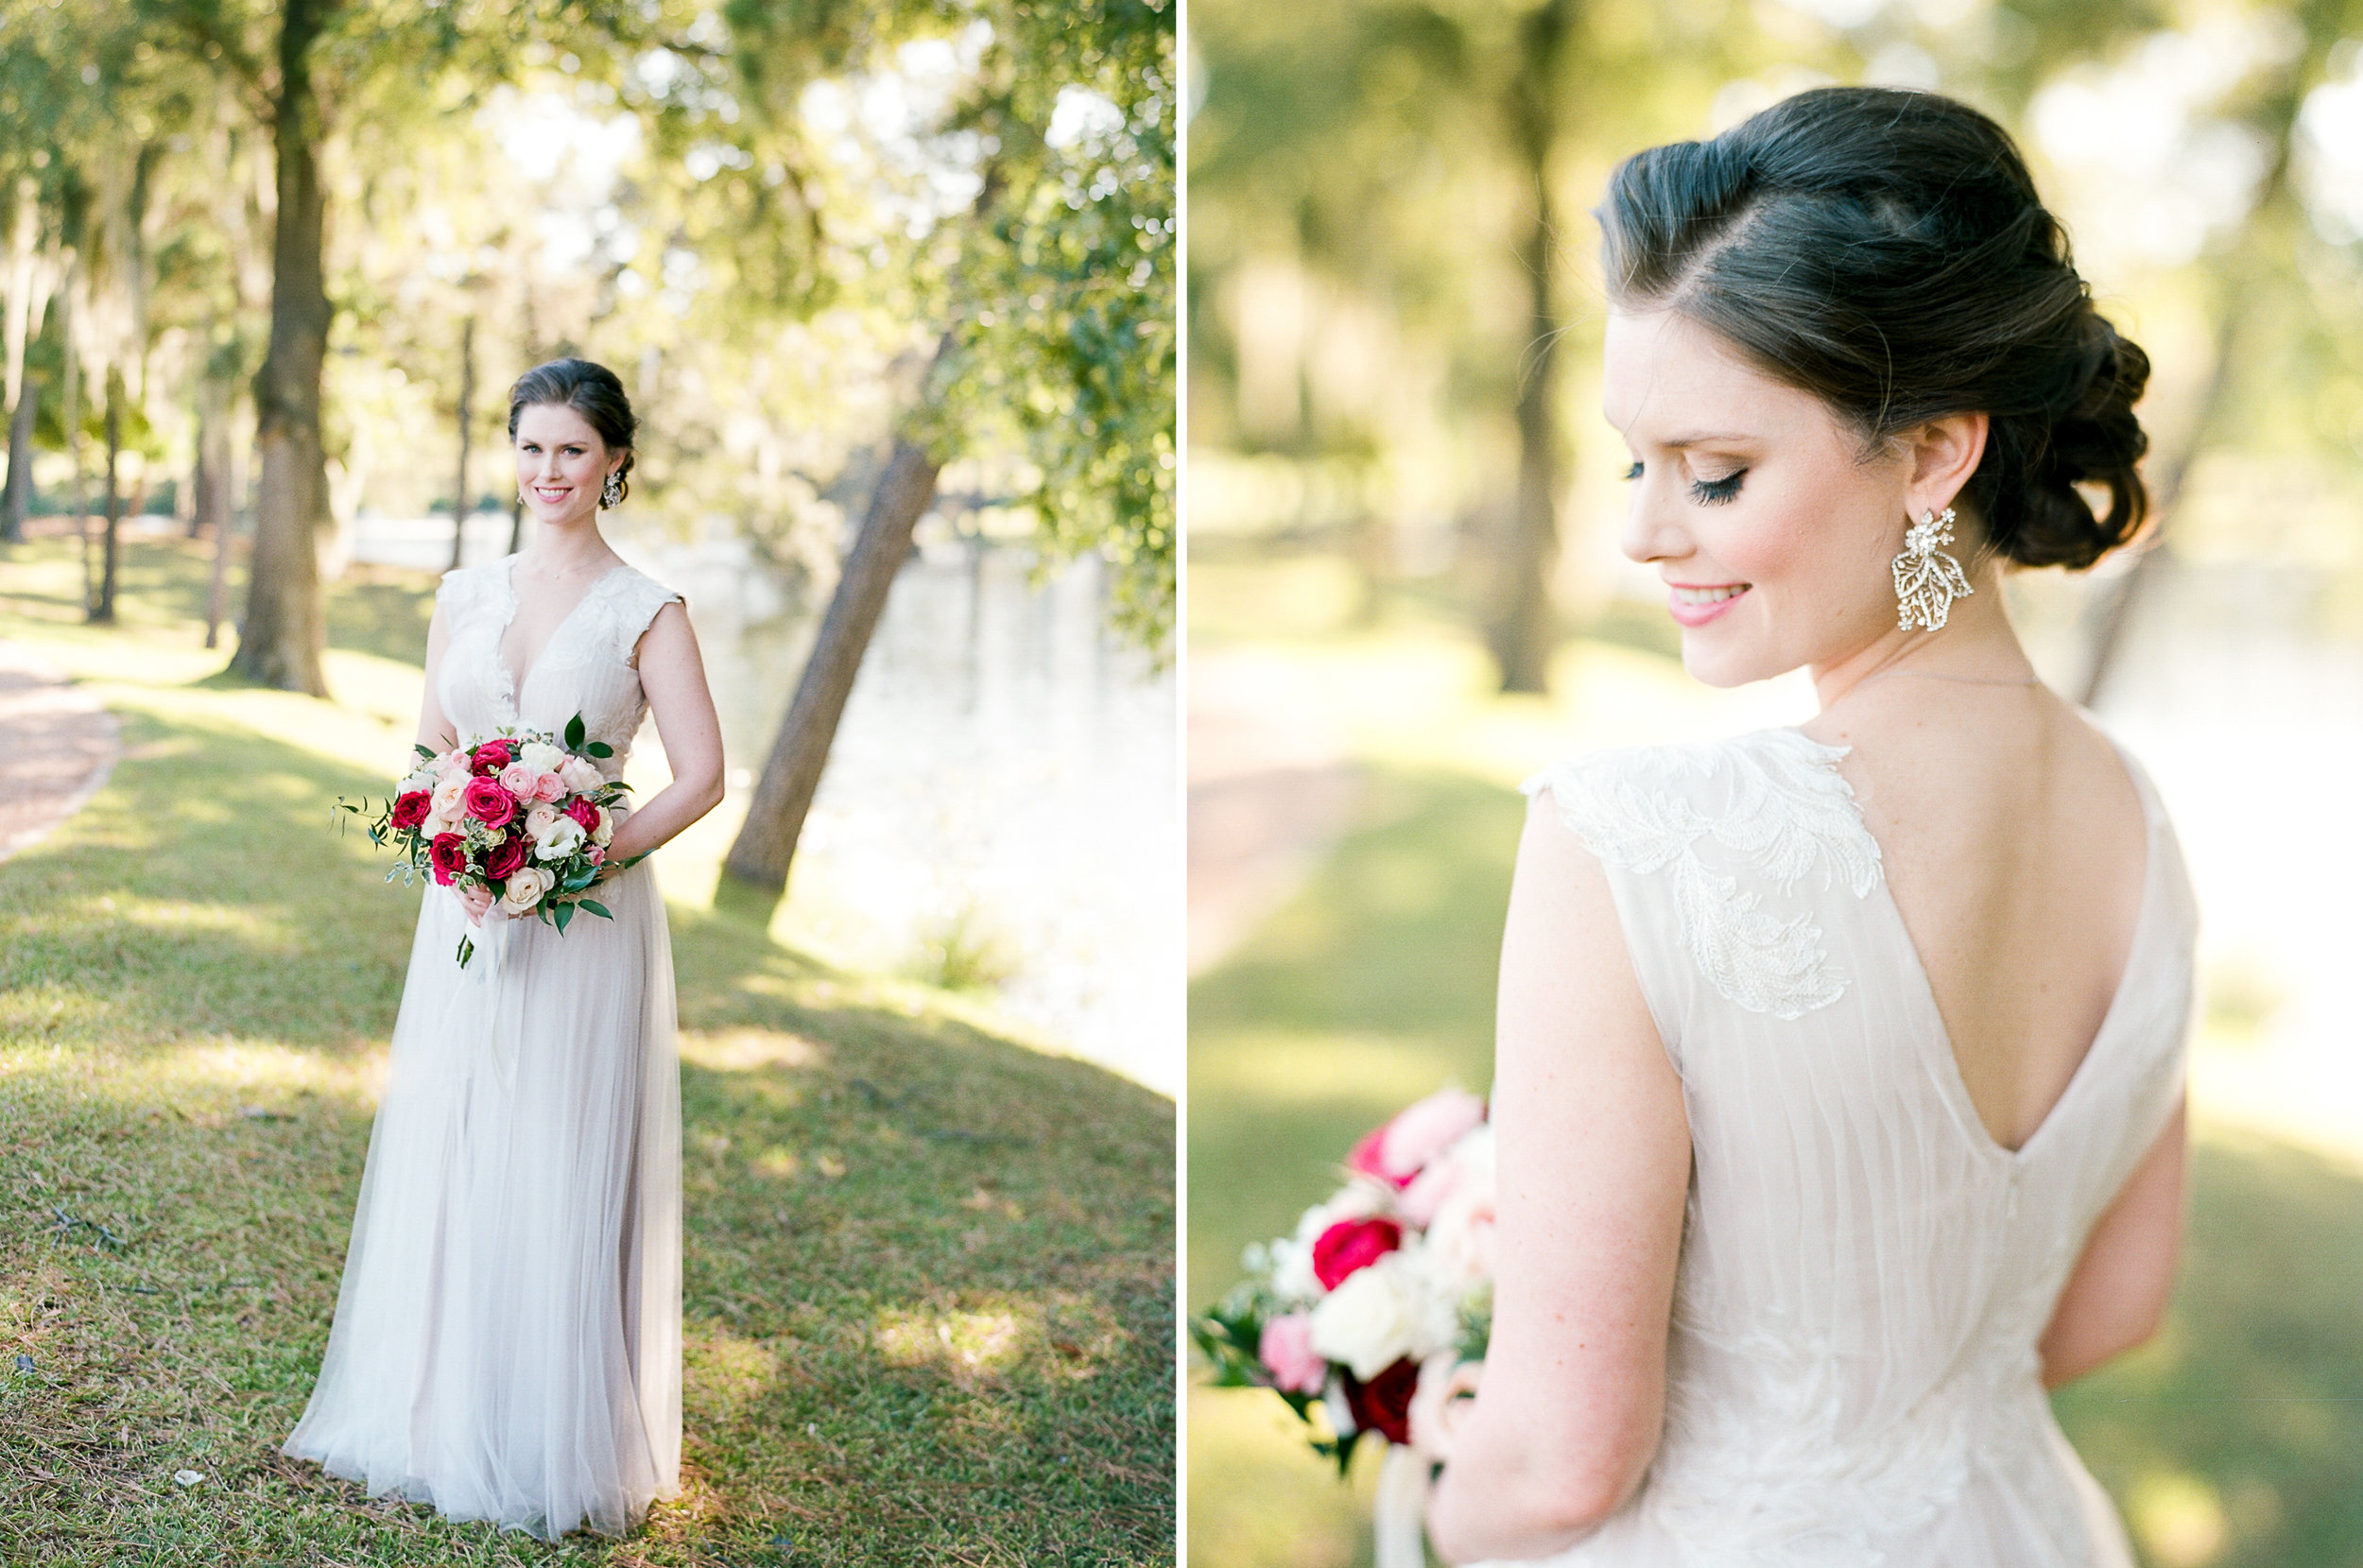 Houston-Wedding-Photographer-Lakeside-Country-Club-First-Look-Bride-Groom-Formals-Film-Fine-Art-Photography-103.jpg